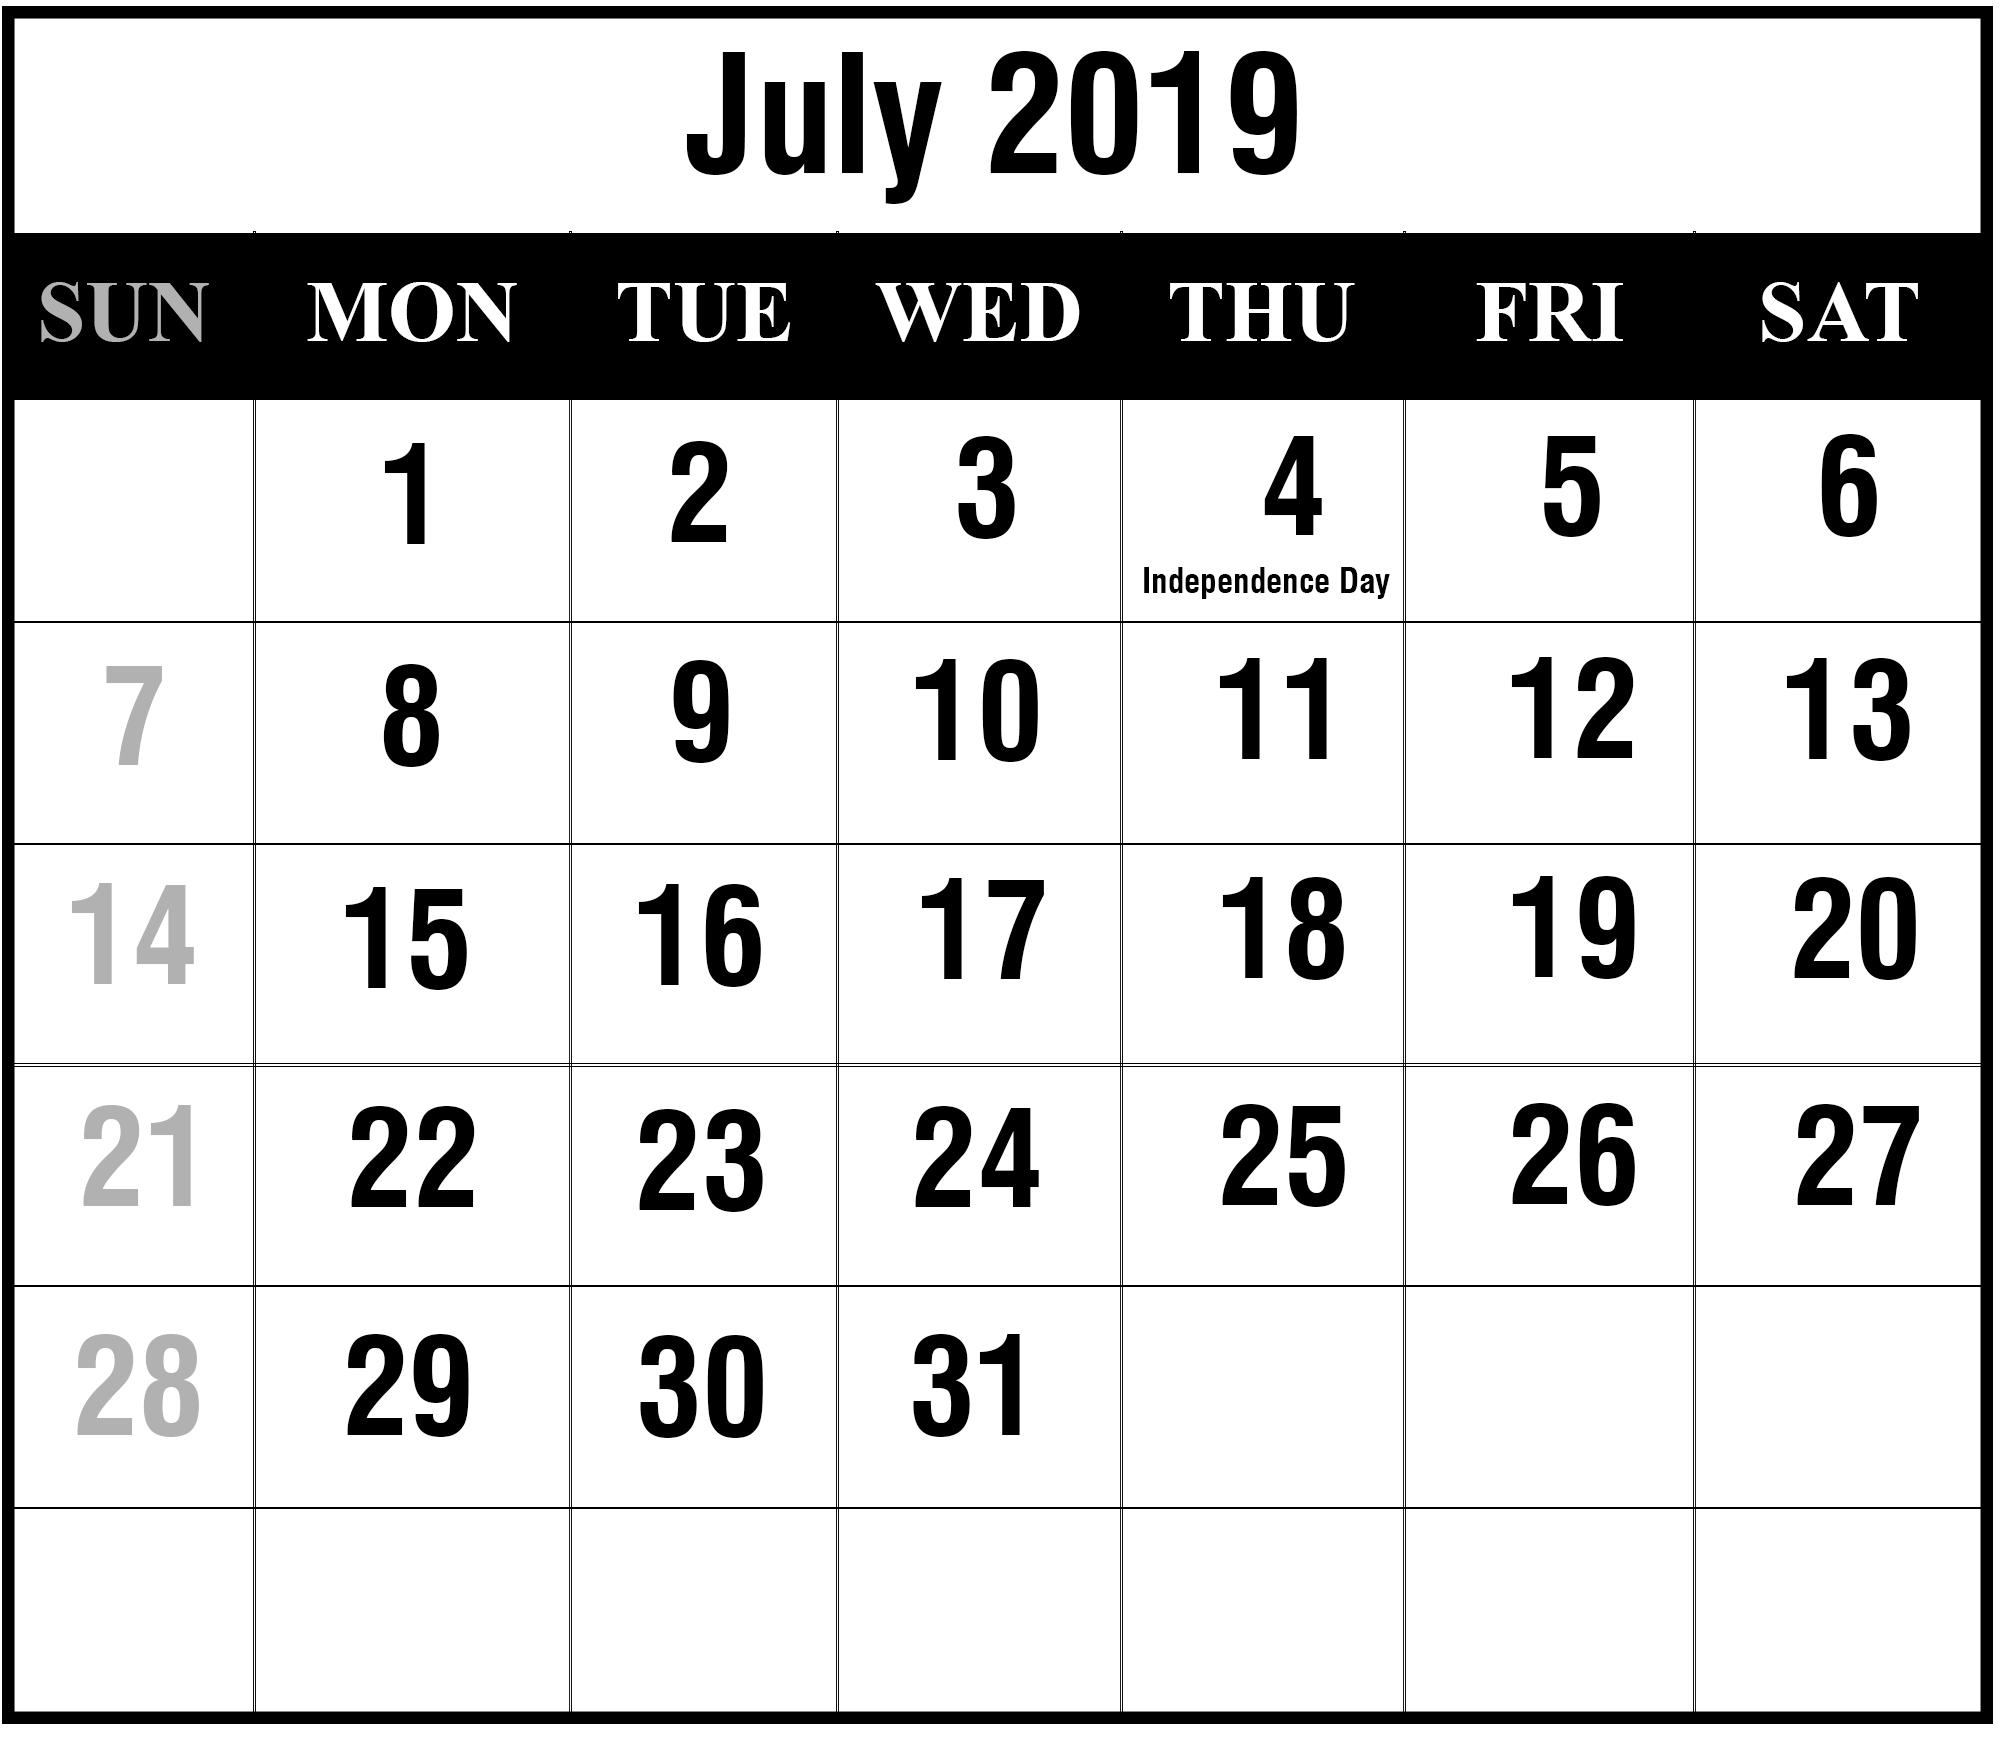 July 2019 Calendar Printable | July Blank Calendar Template-6 Month Calendar 2020 July Dec Template